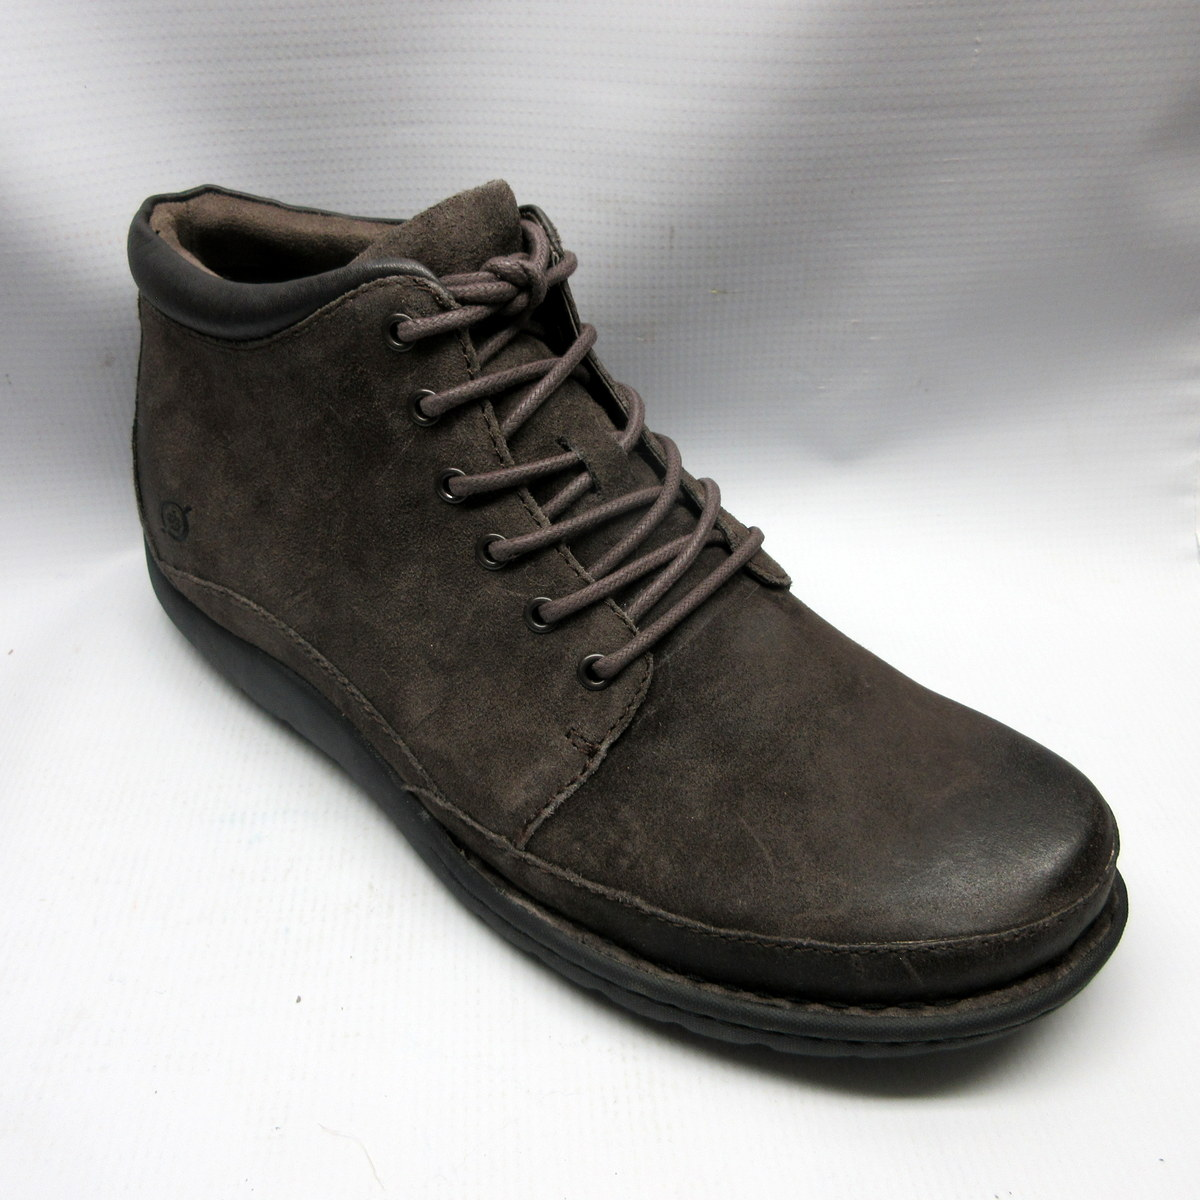 c2cb32f8dc0 Born Boots Men Nigel in Grey — Cabaline